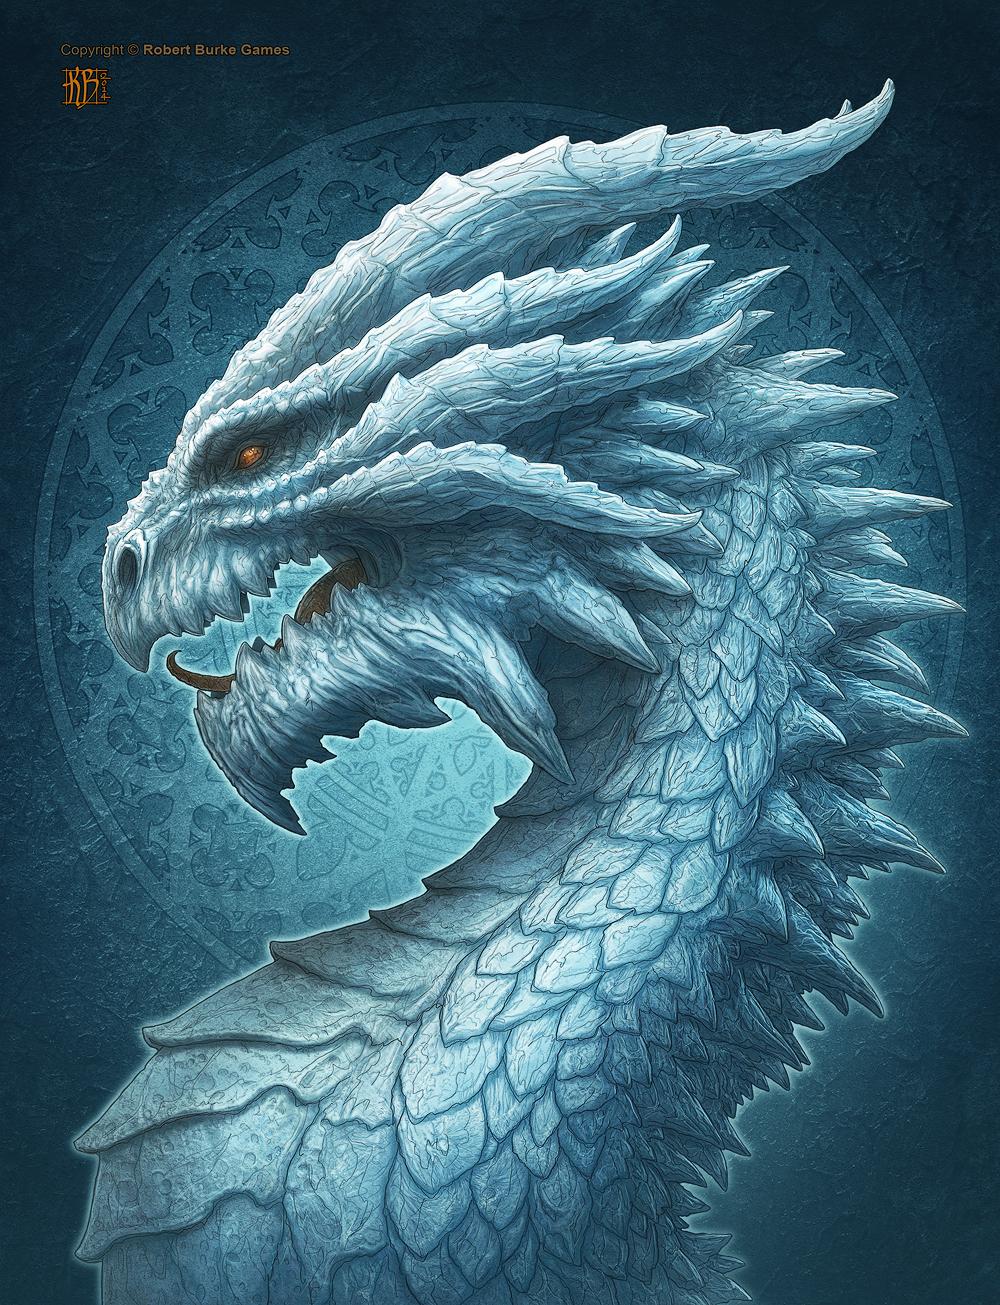 Kerembeyit ice dragon 1 92b534e5 bol4